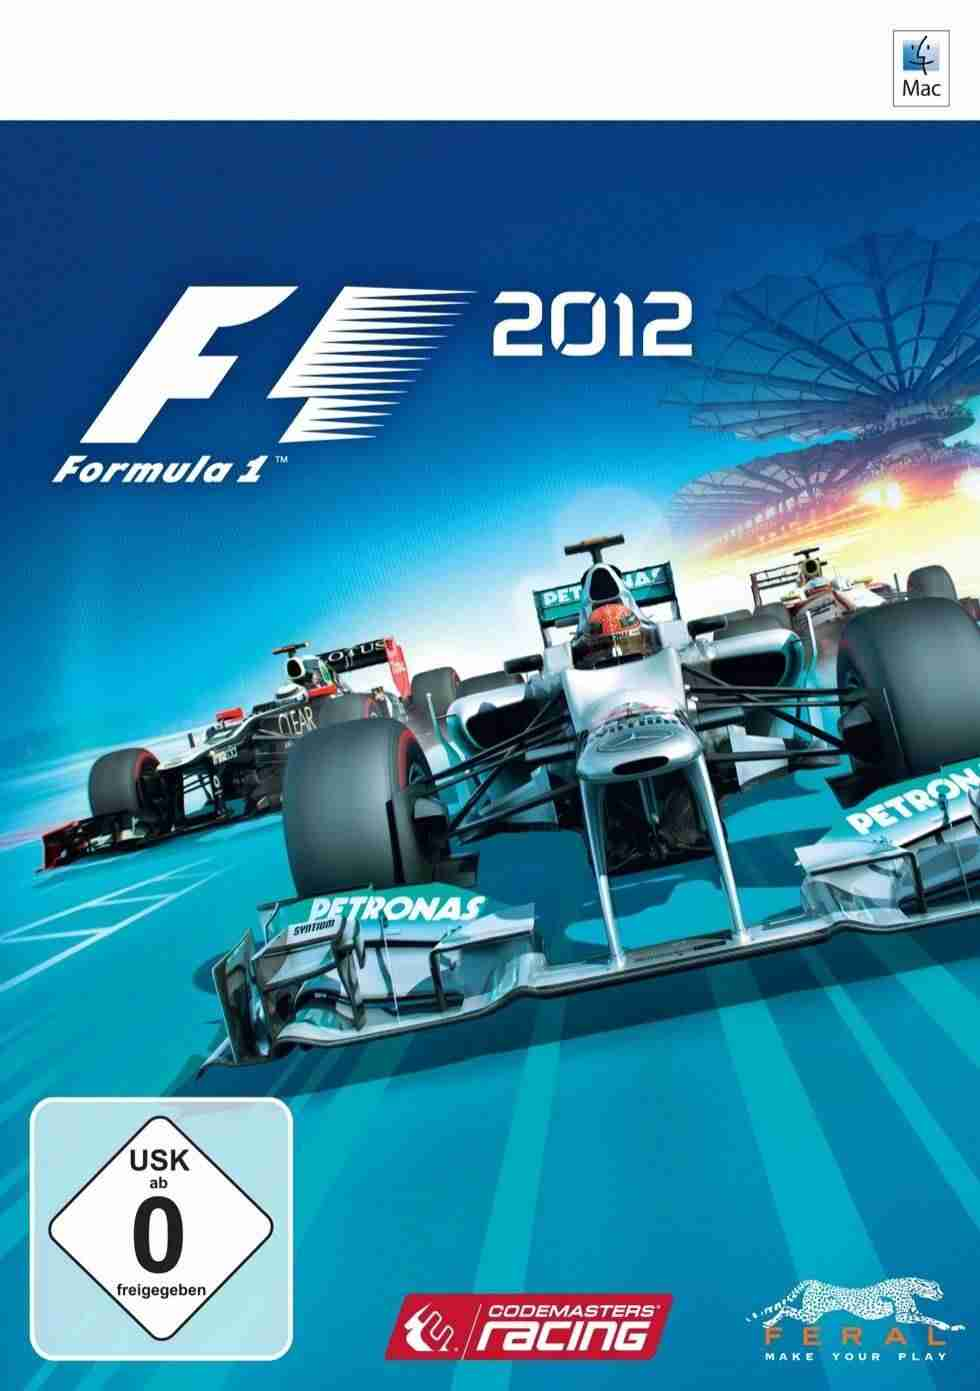 Descargar F1 2012 [MULTI][MACOSX][MONEY] por Torrent